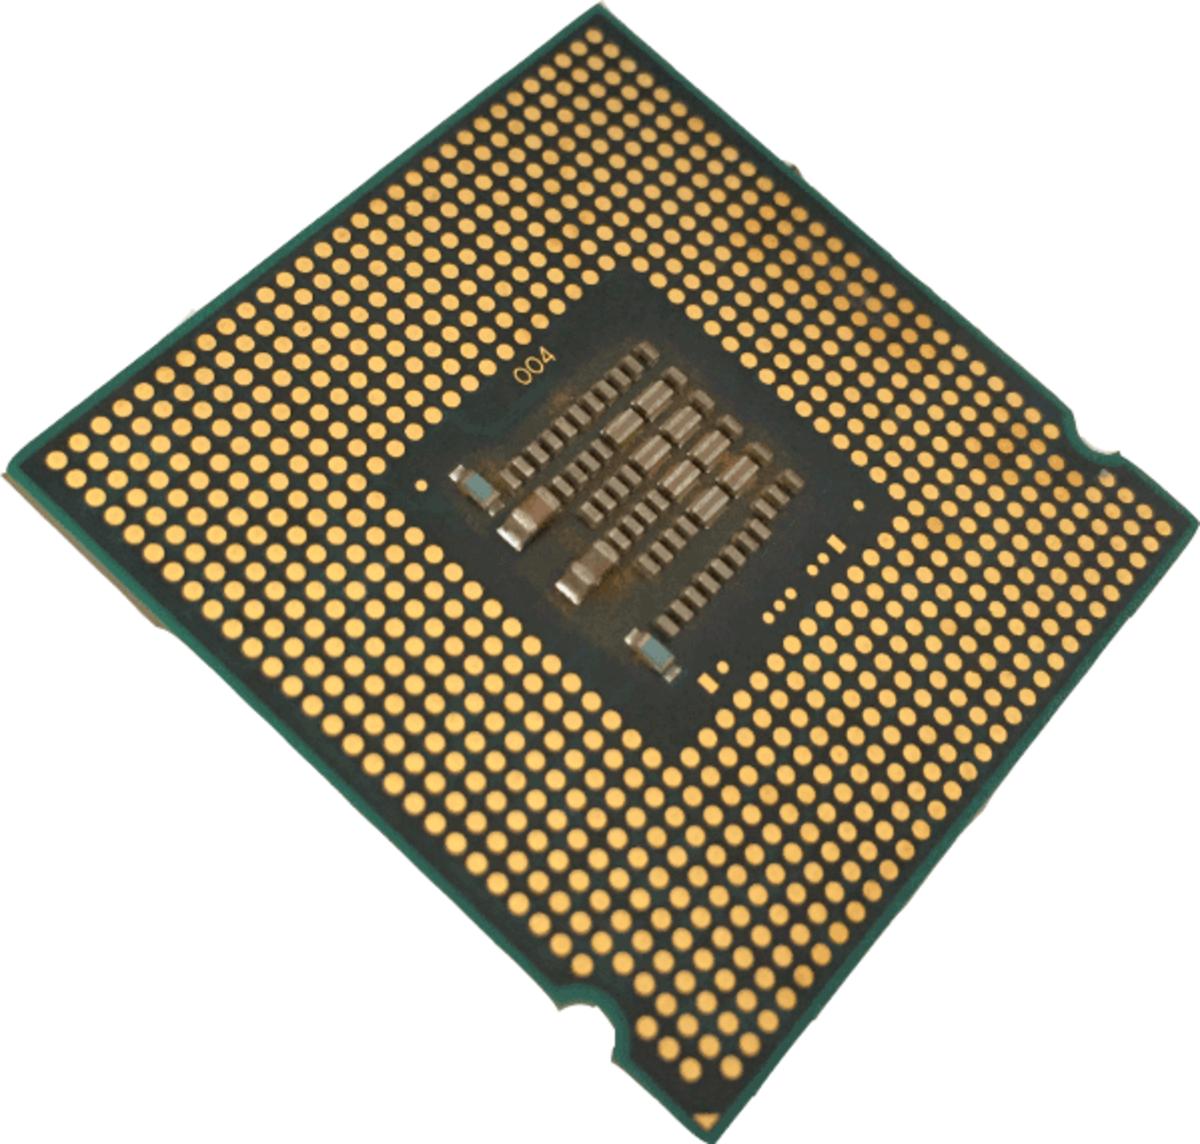 The modern microprocessor.